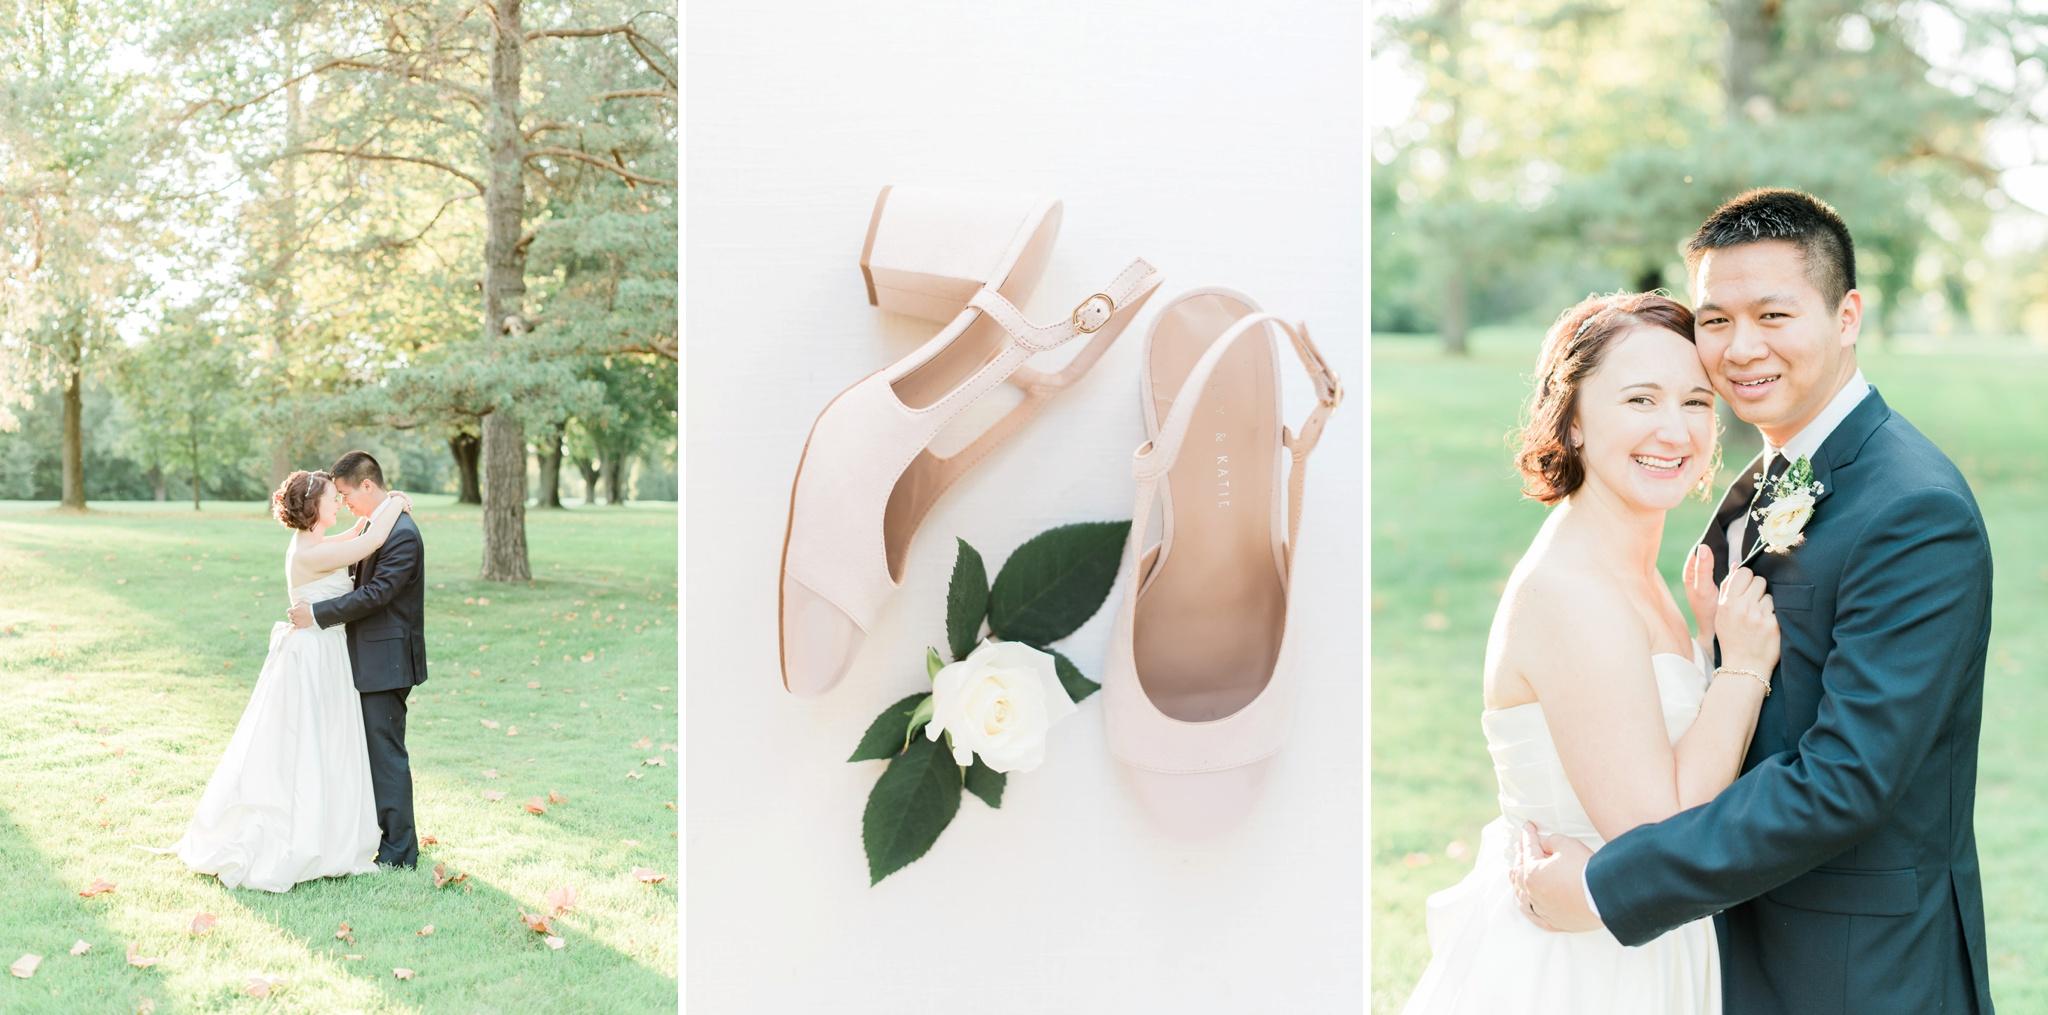 brookside-golf-country-club-wedding-columbus-ohio-126.jpg